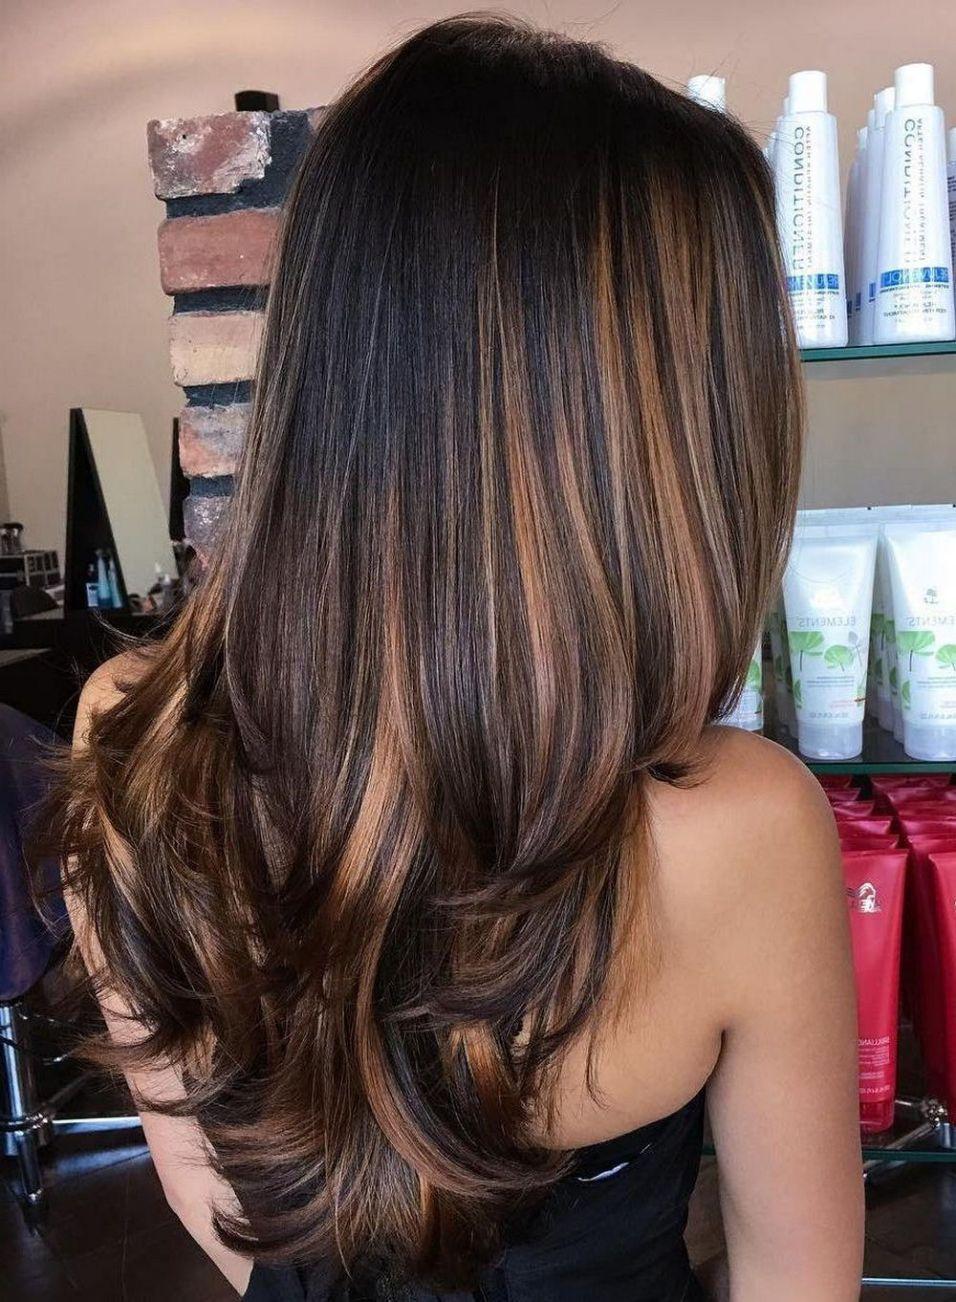 70 Flattering Balayage Hair Color Ideas For 2020 Dark Hair With Highlights Hair Color For Black Hair Hair Color Asian